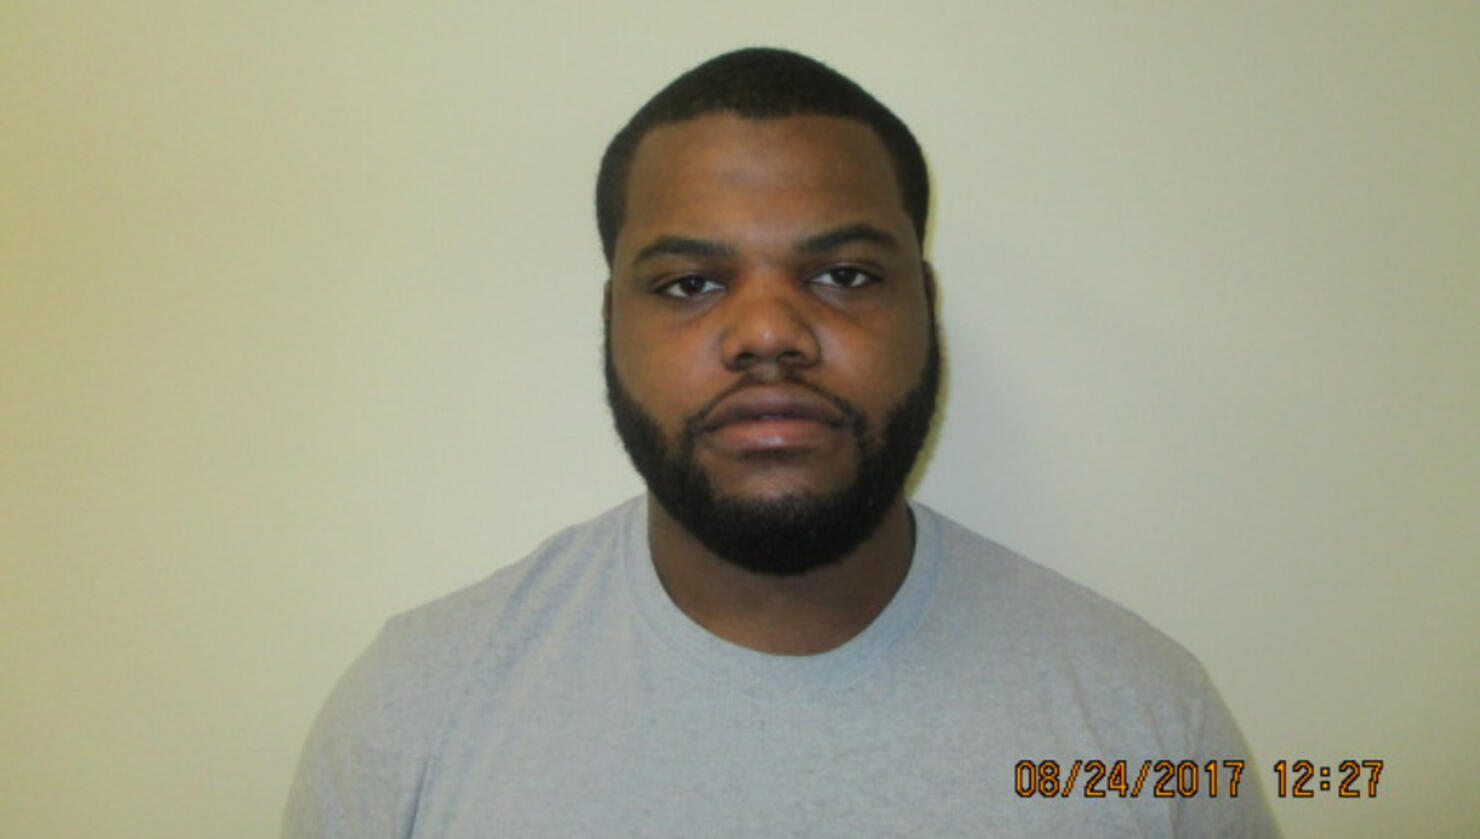 Terrell Gray mug shot